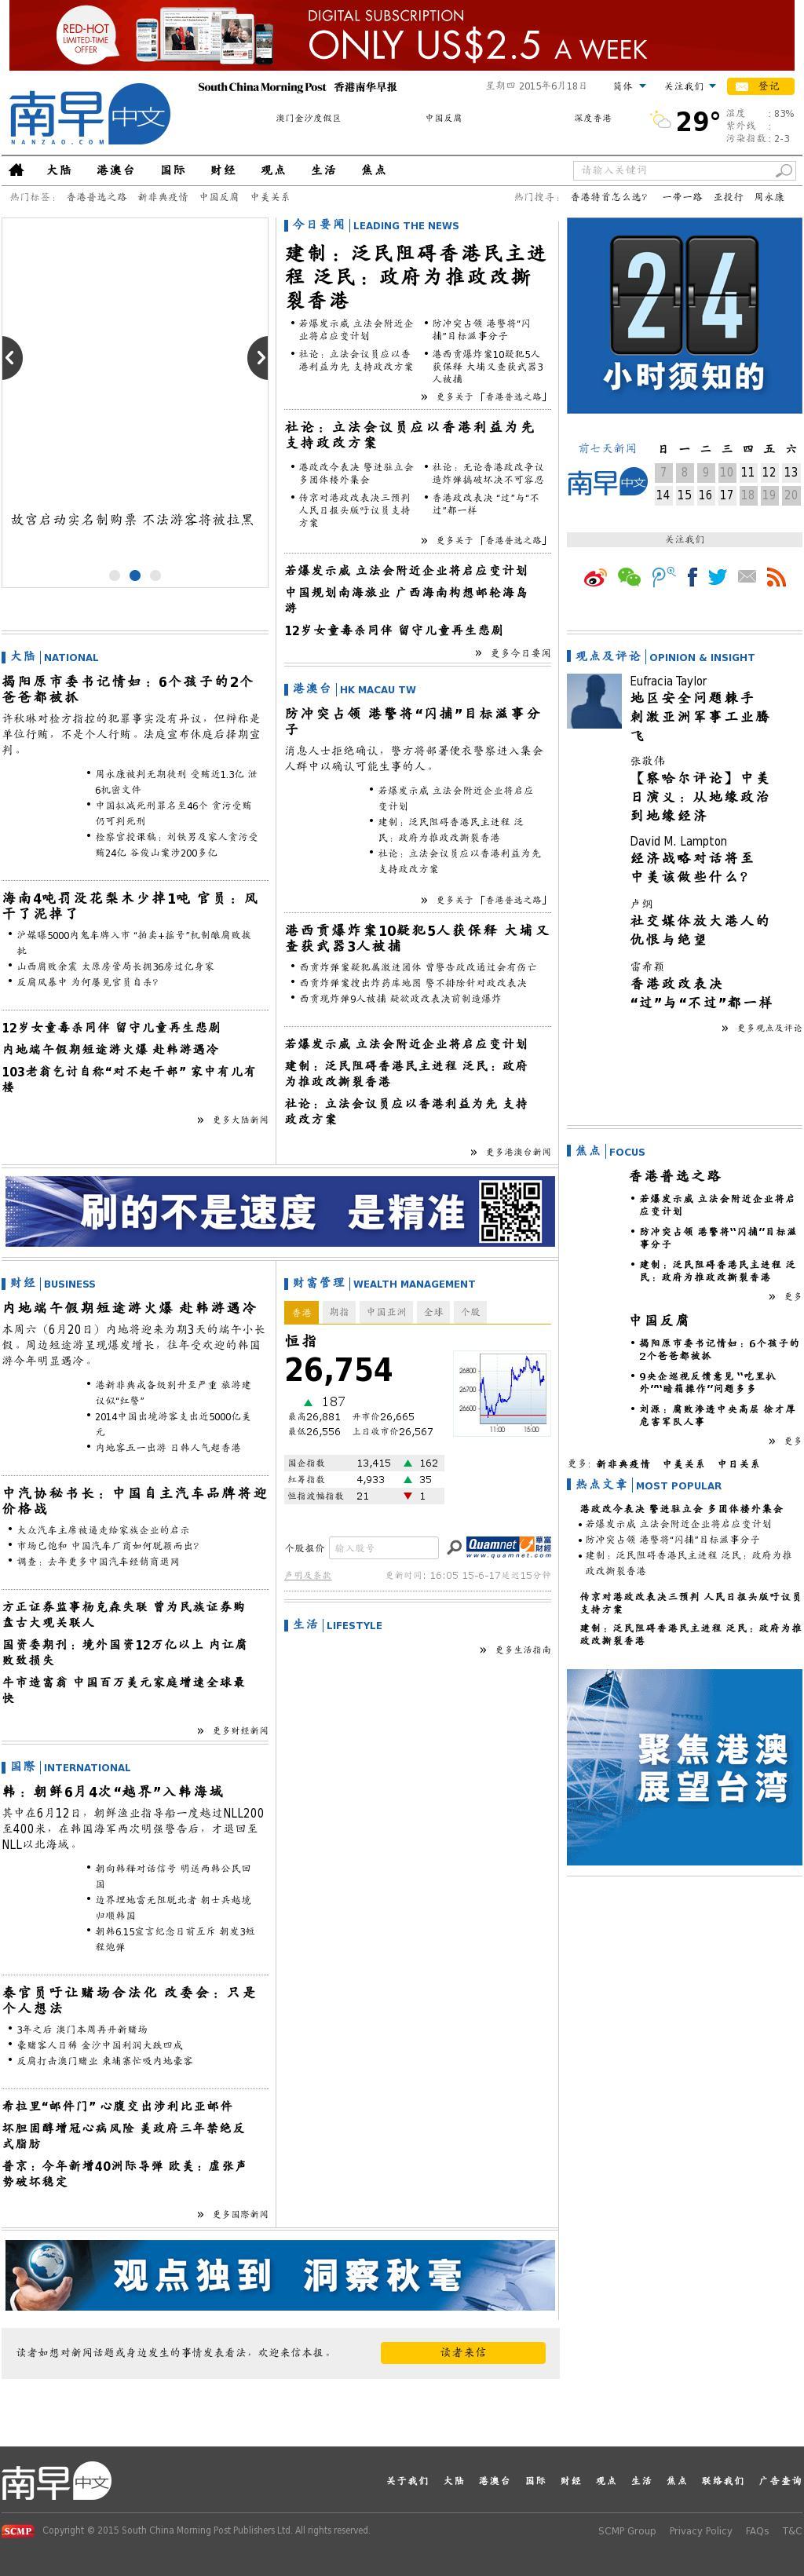 South China Morning Post (Chinese) at Wednesday June 17, 2015, 6:24 p.m. UTC